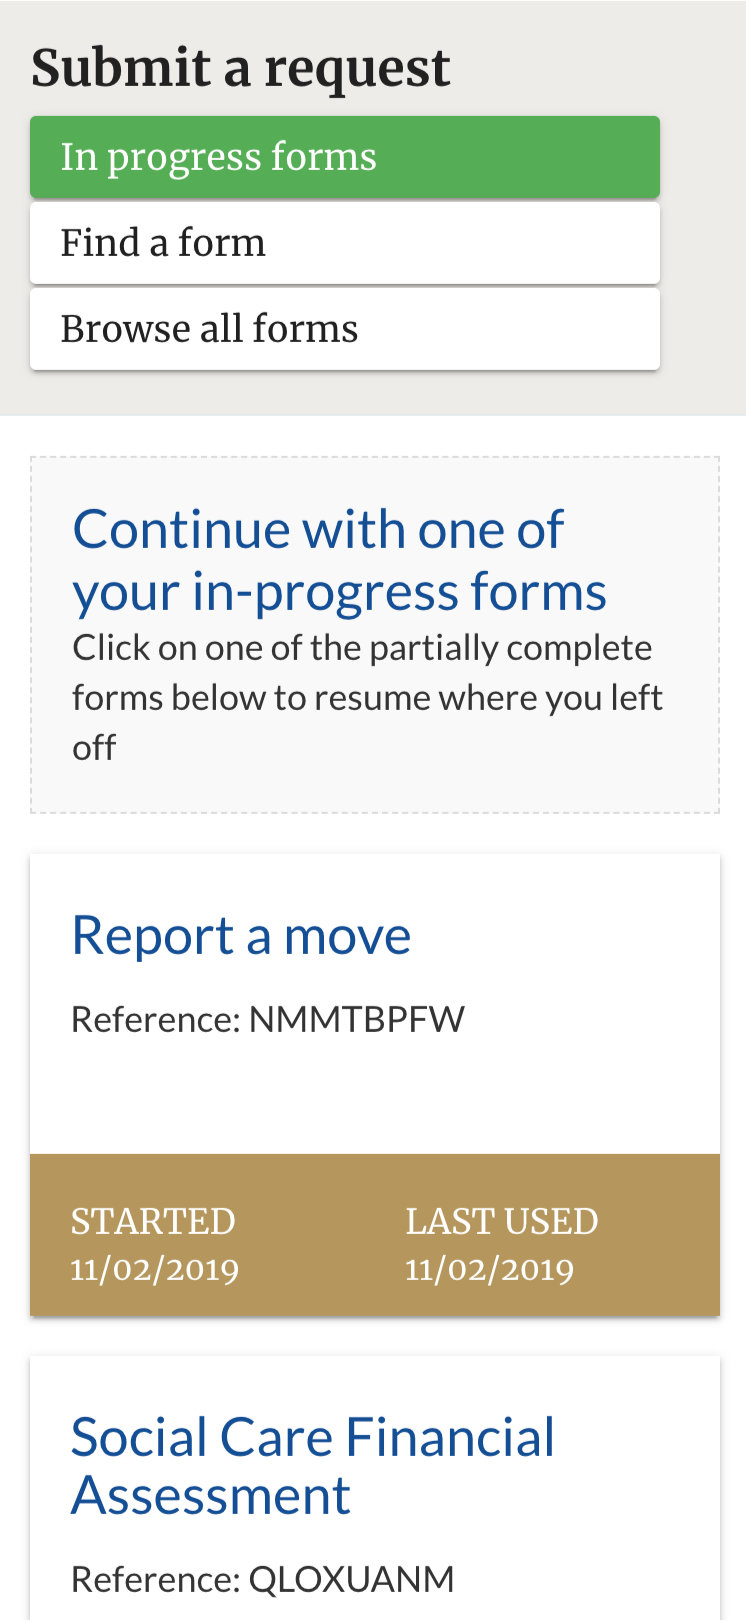 Mobile device screen shot showing IEG4 OneVu Citizen Engagement Platform